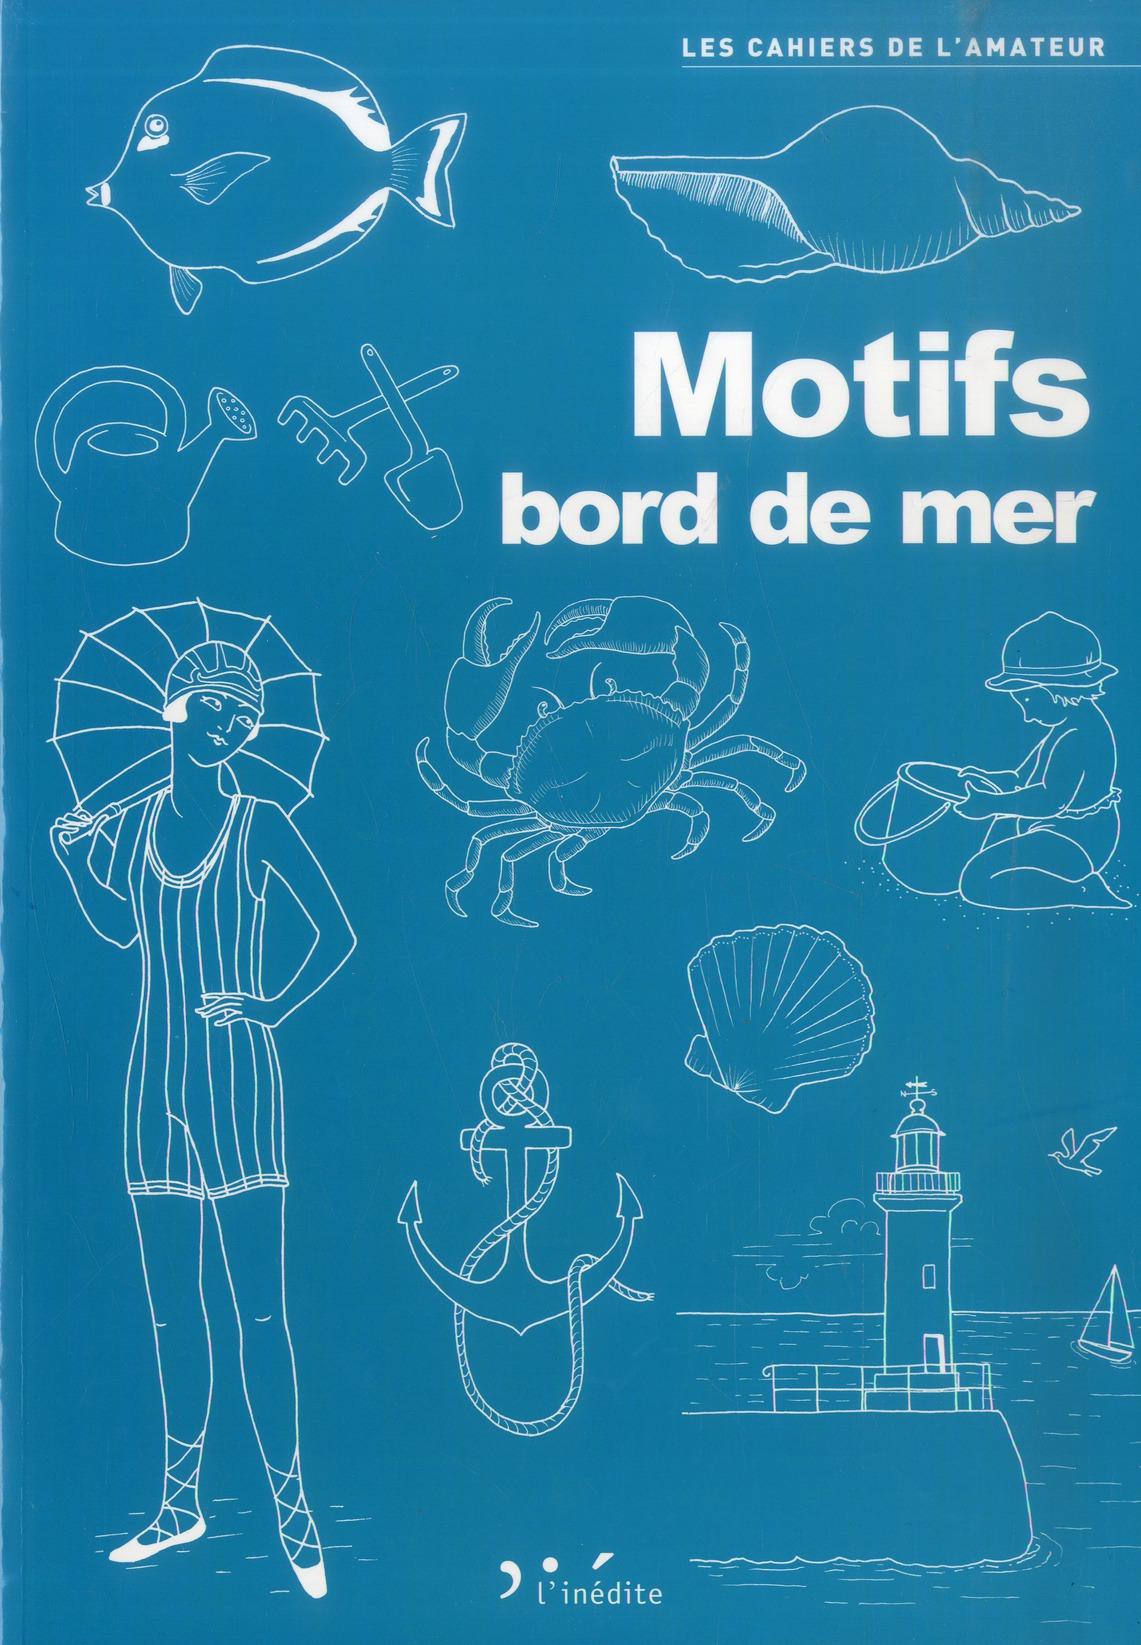 MOTIFS BORD DE MER